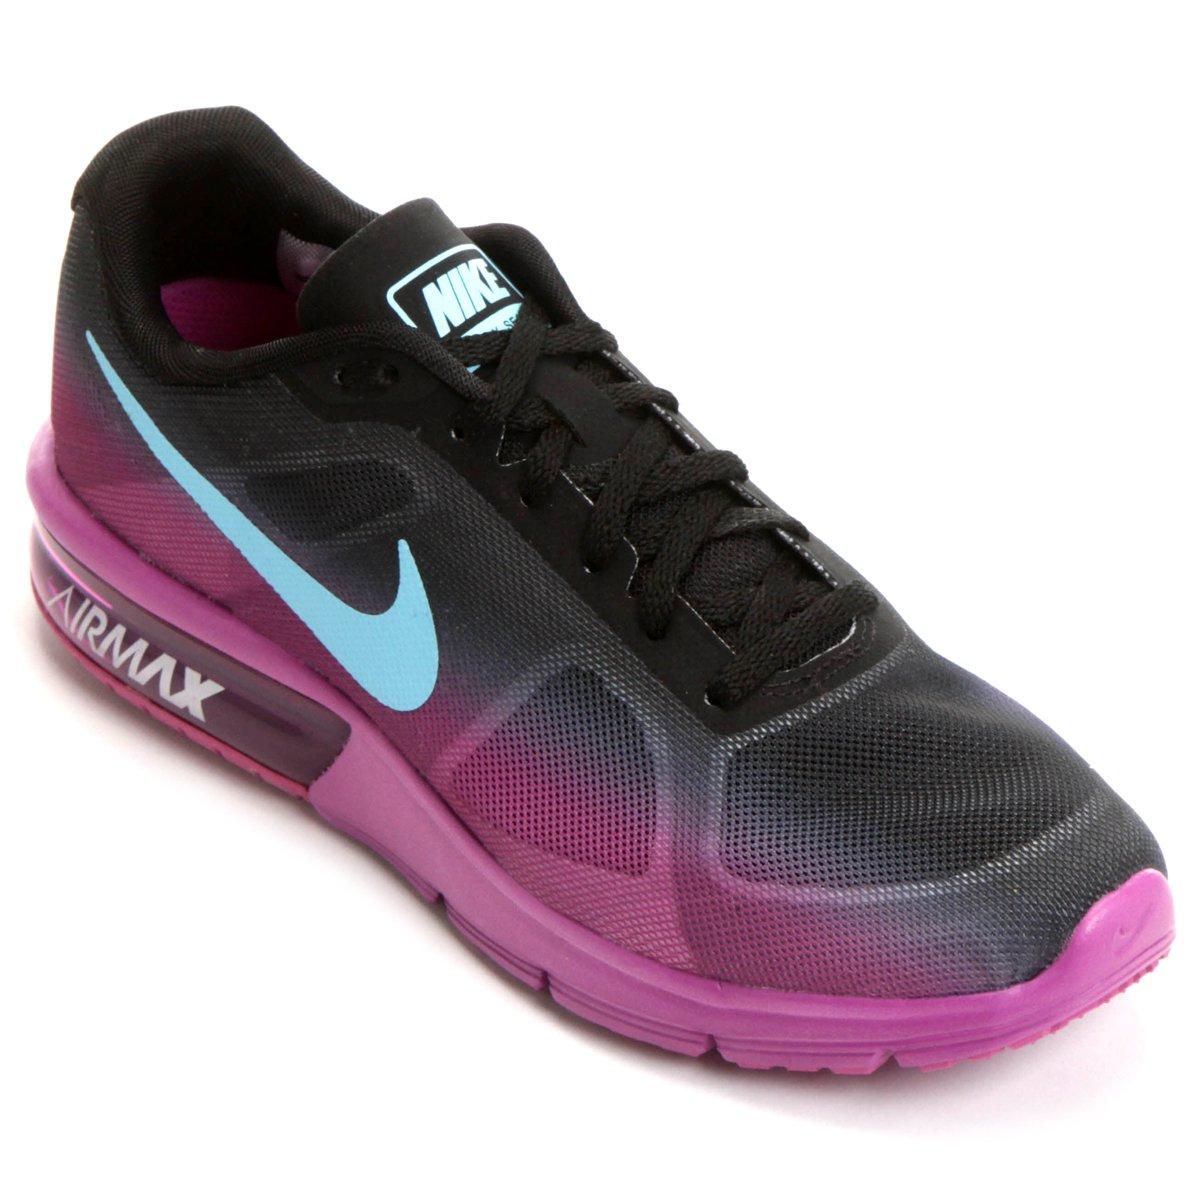 82c6cfcf747 Tênis Nike Air Max Sequent Feminino - Compre Agora